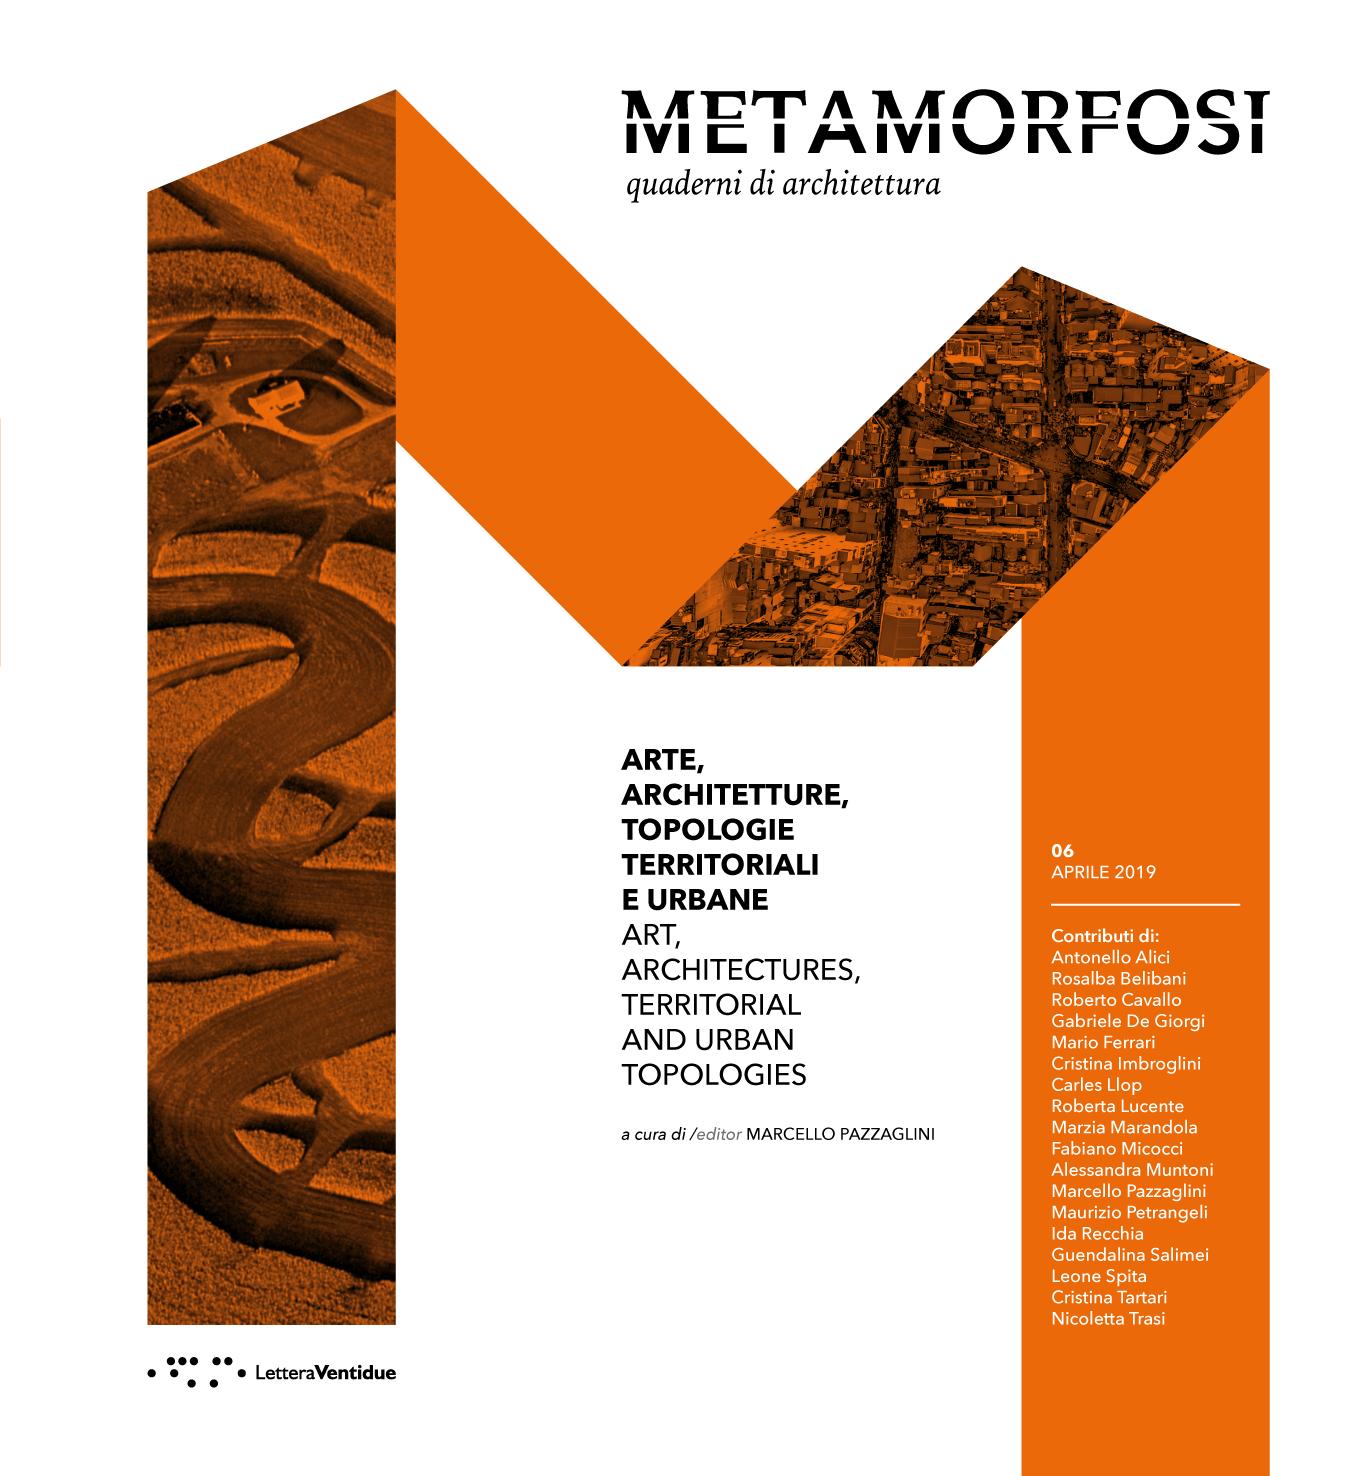 Metamorfosi 06 - LetteraVentidue